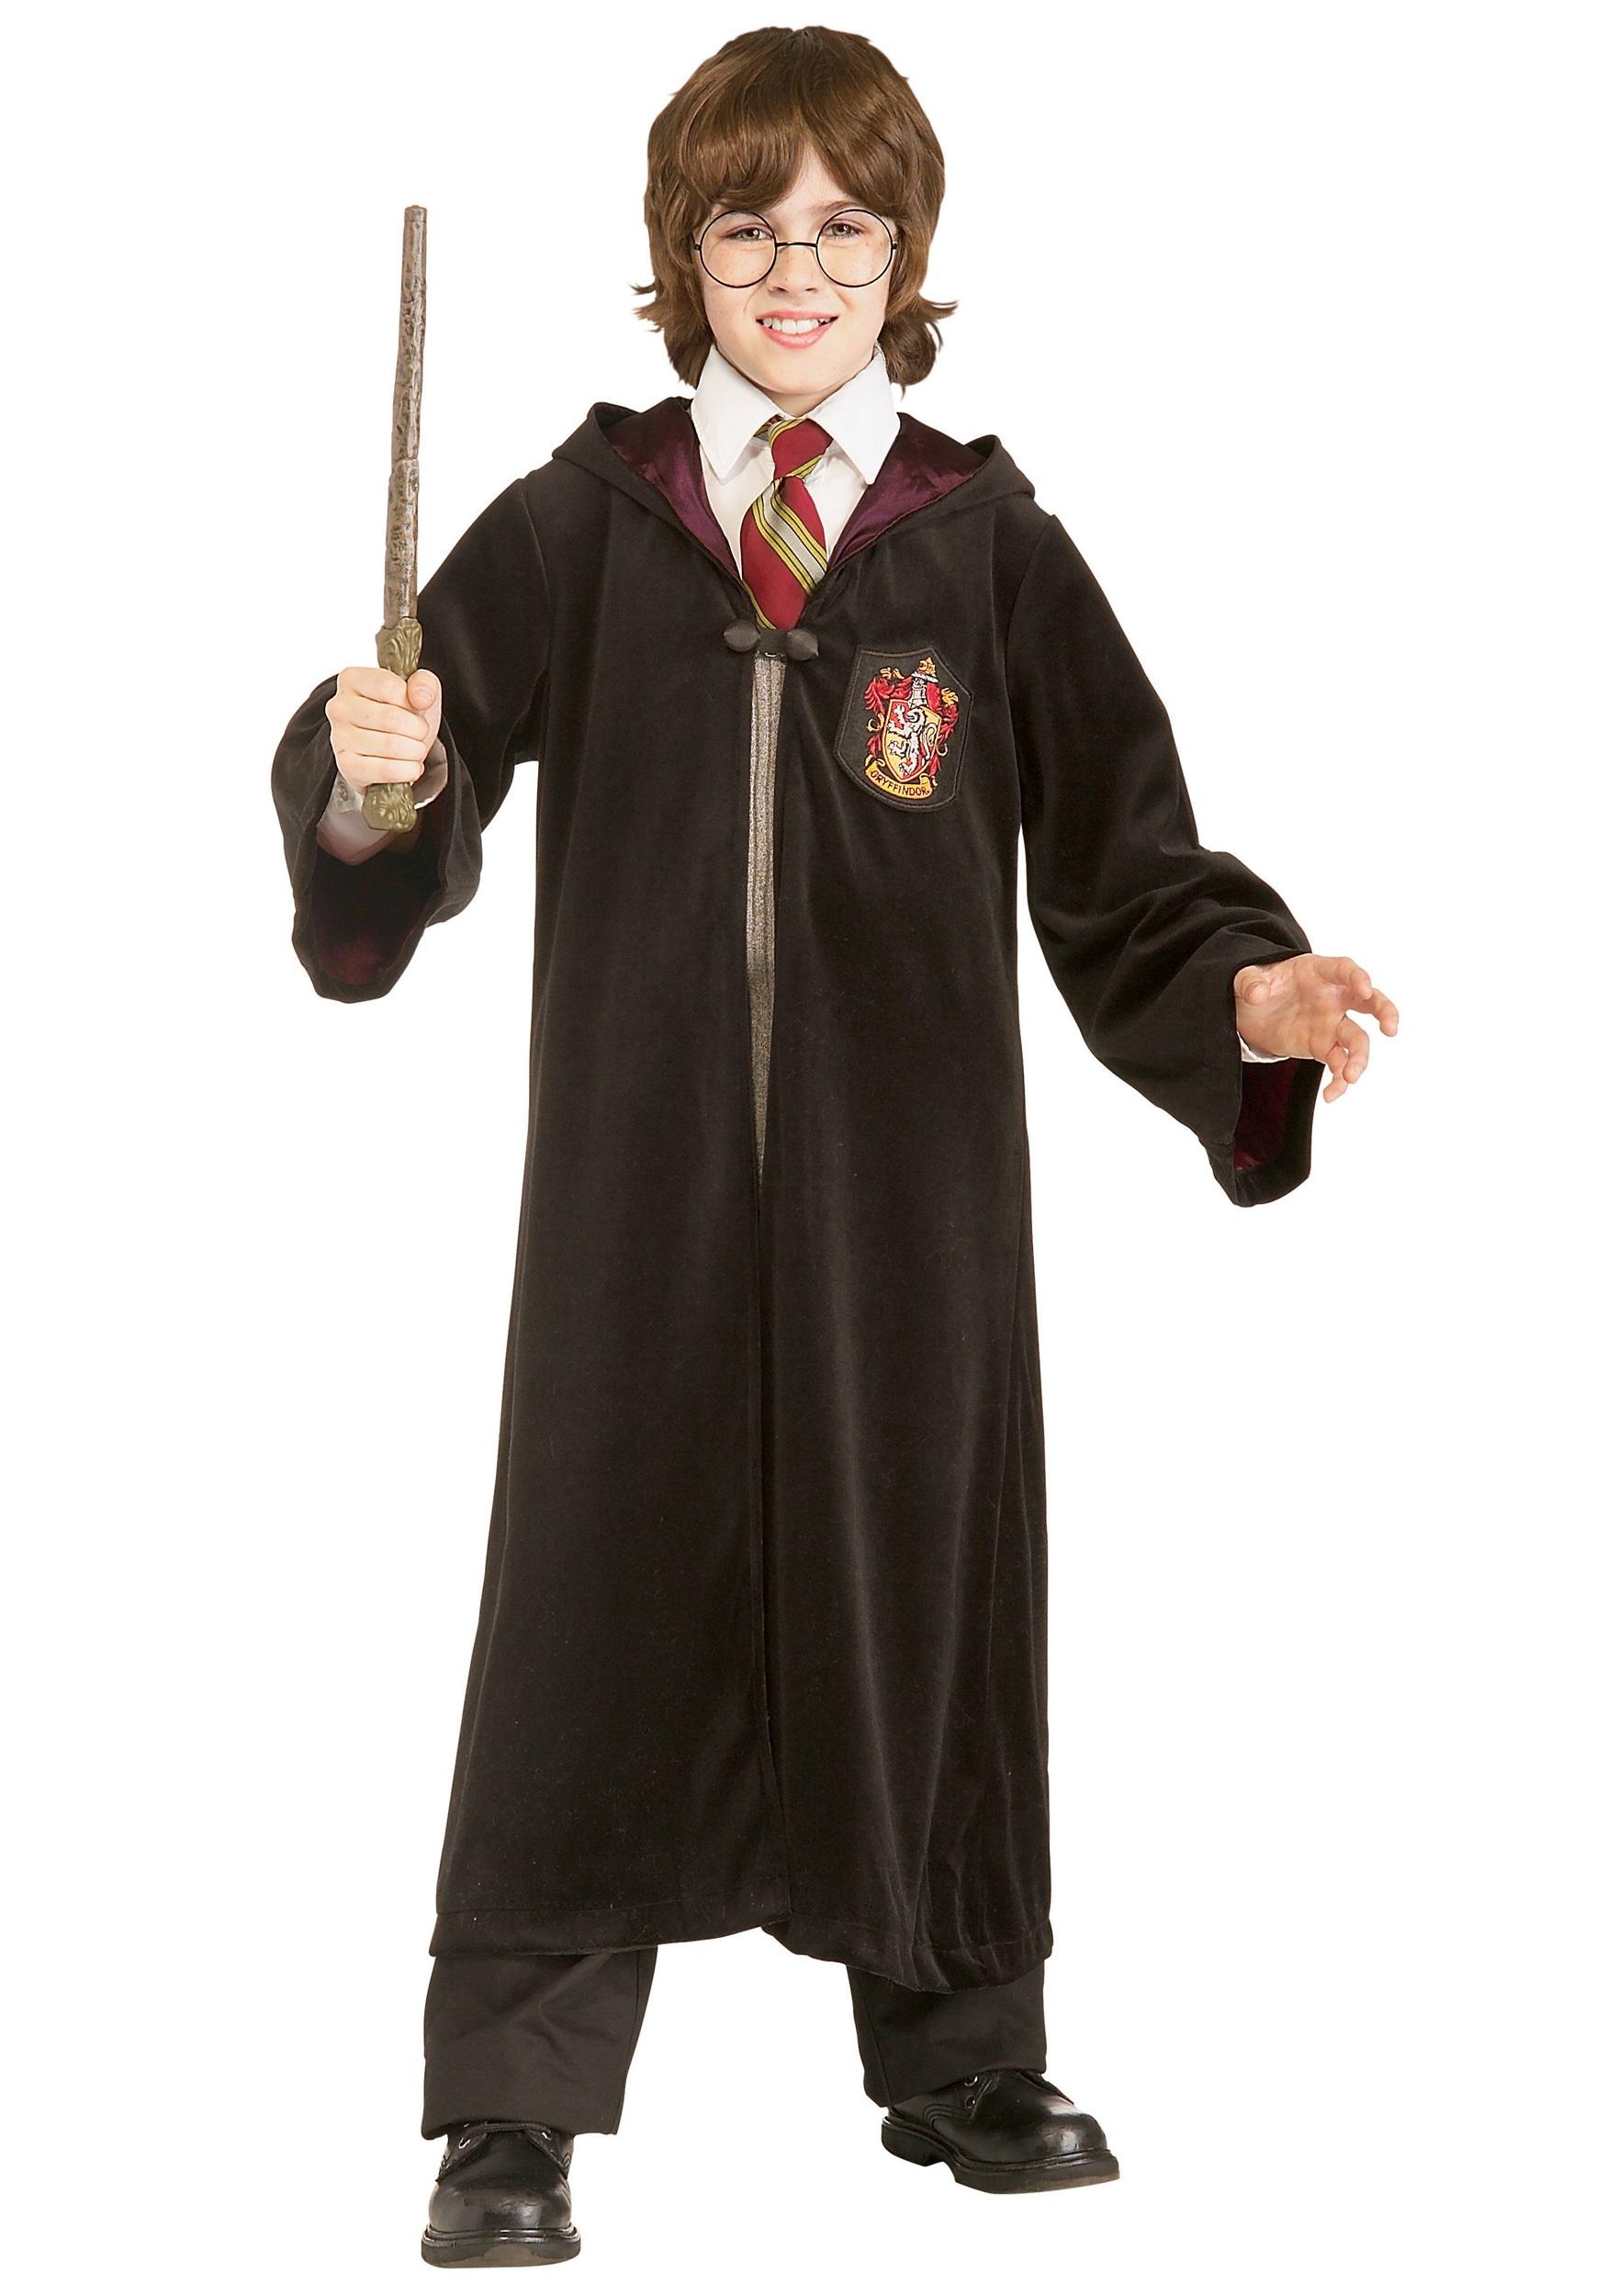 Authentic Child Harry Potter Costume